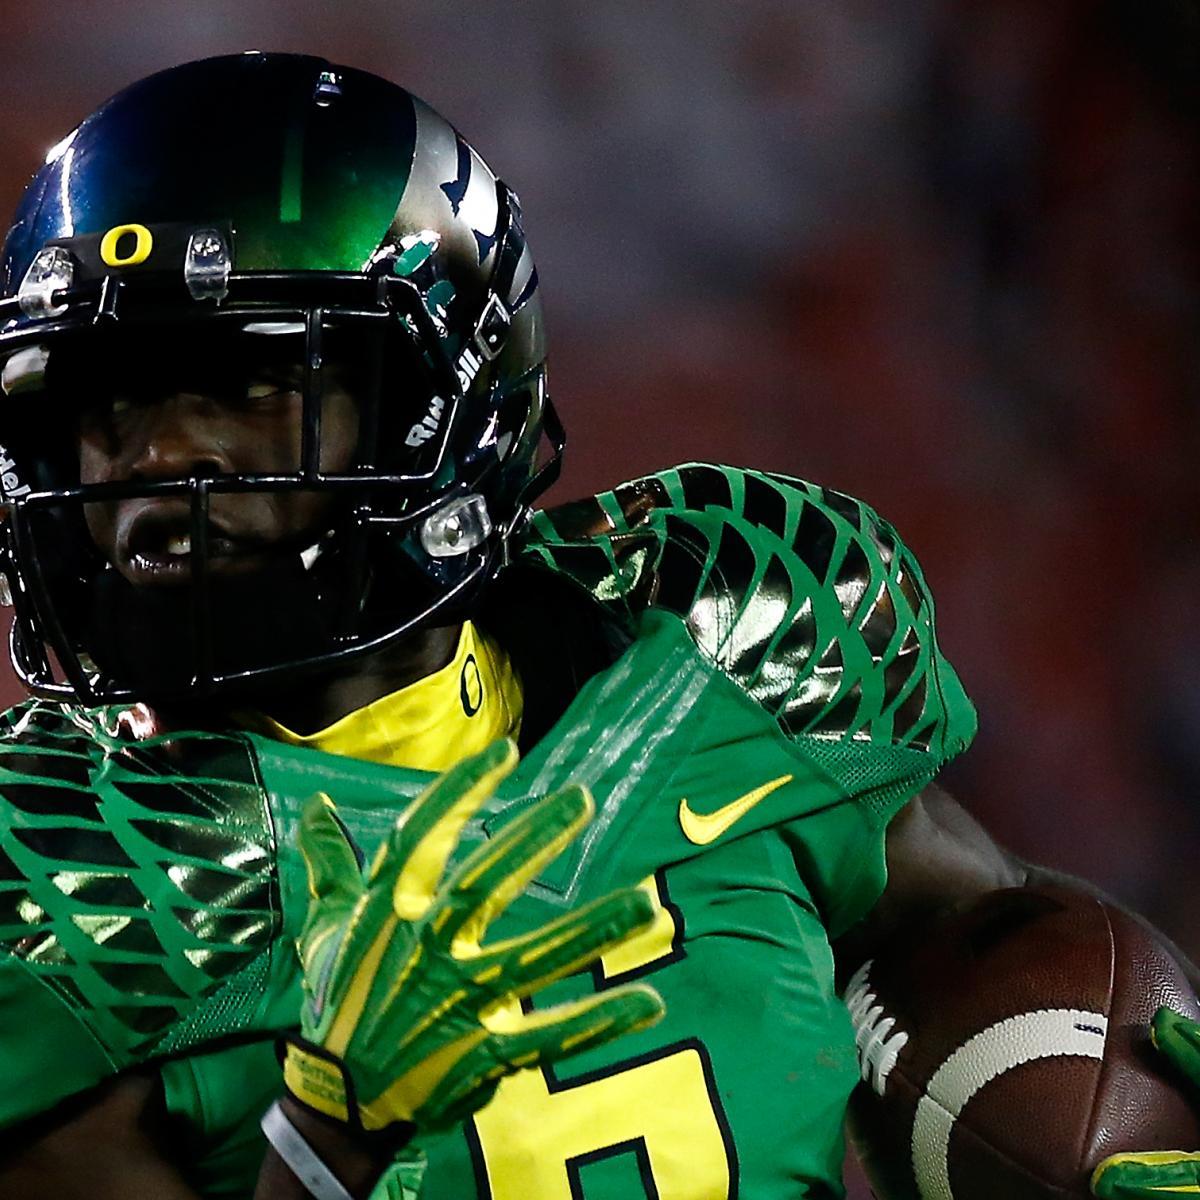 Oregon Ducks New Bowl Uniform Is Latest Innovation In Jersey Technology